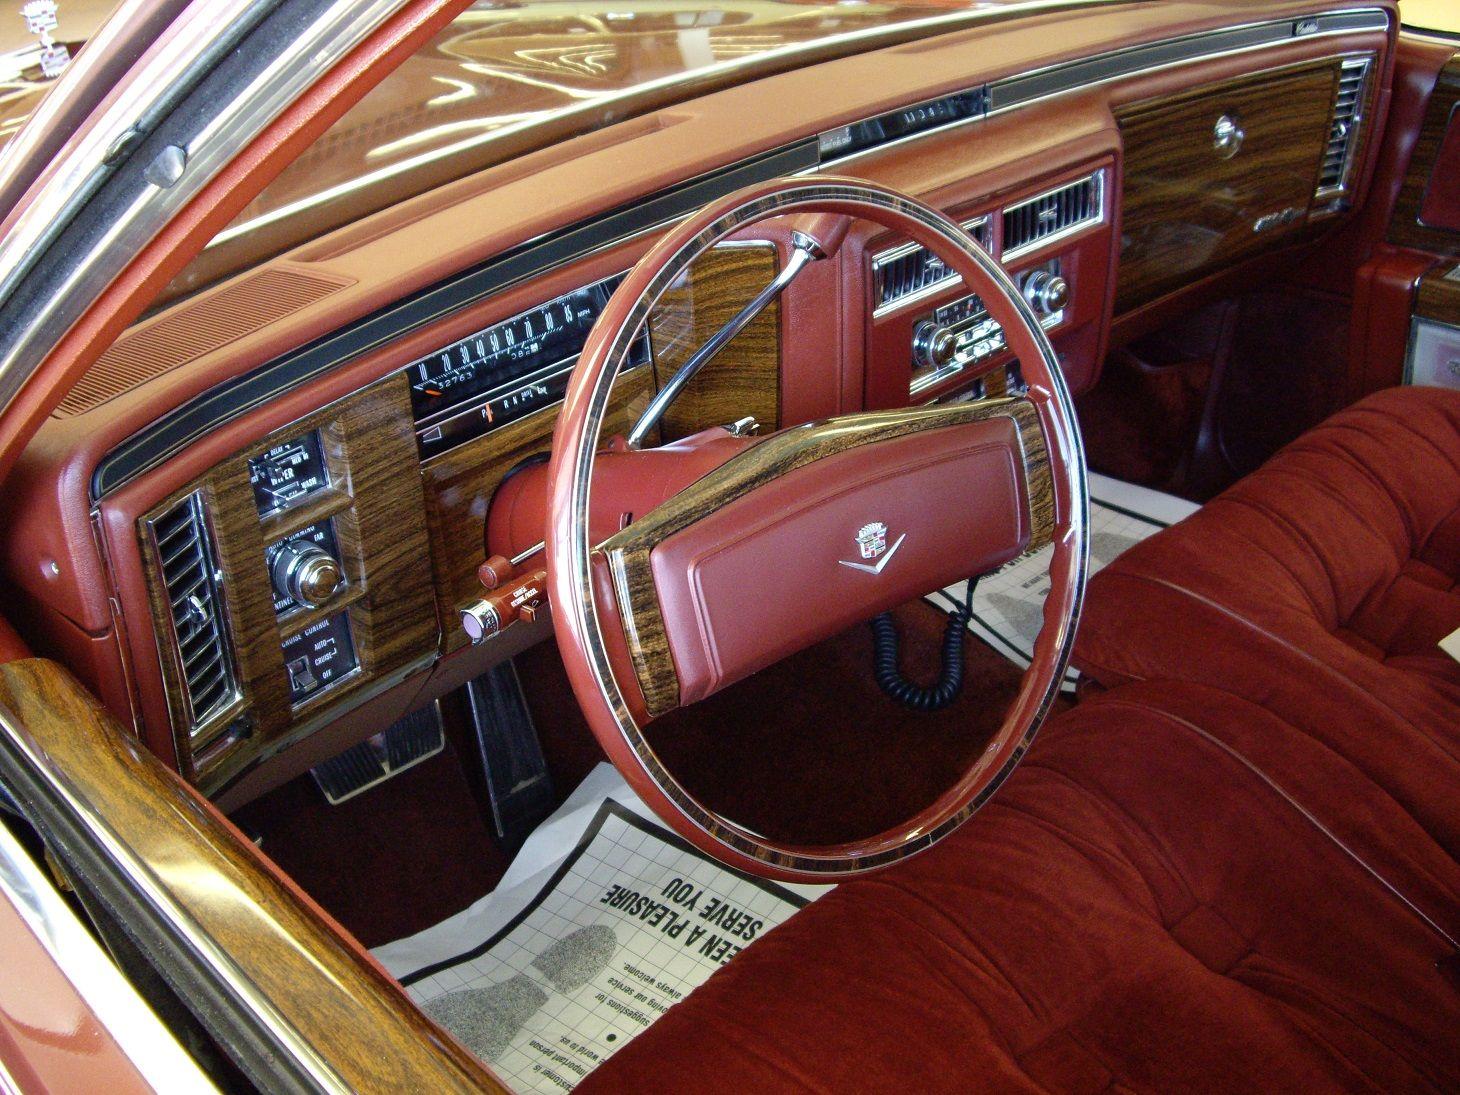 1978 Cadillac Deville D'Elegance interior   Classic Car ...